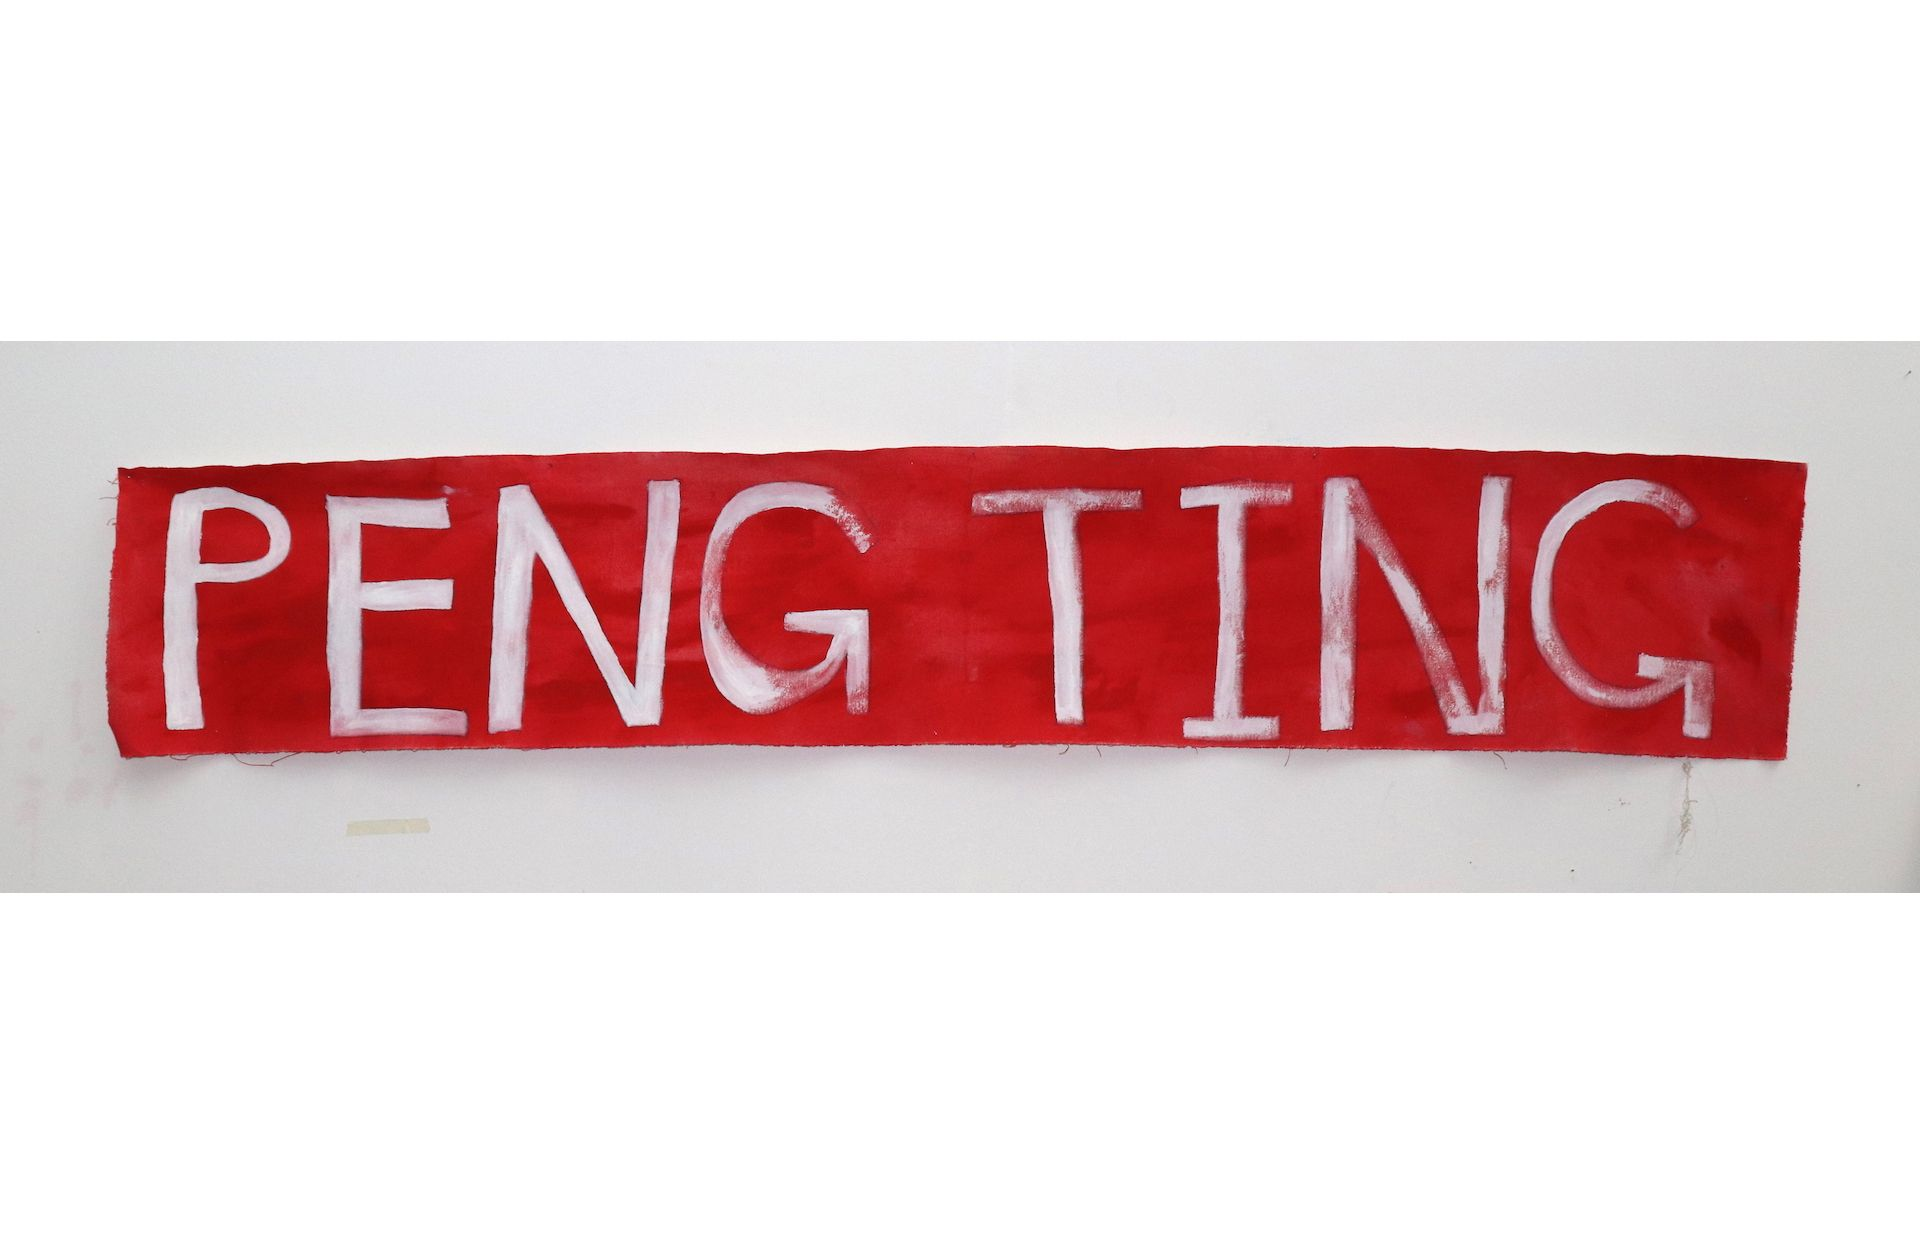 Peng Ting Painting 2019, Sae Yeoun Hwang, Acrylic on canvas 208 x 37 cm